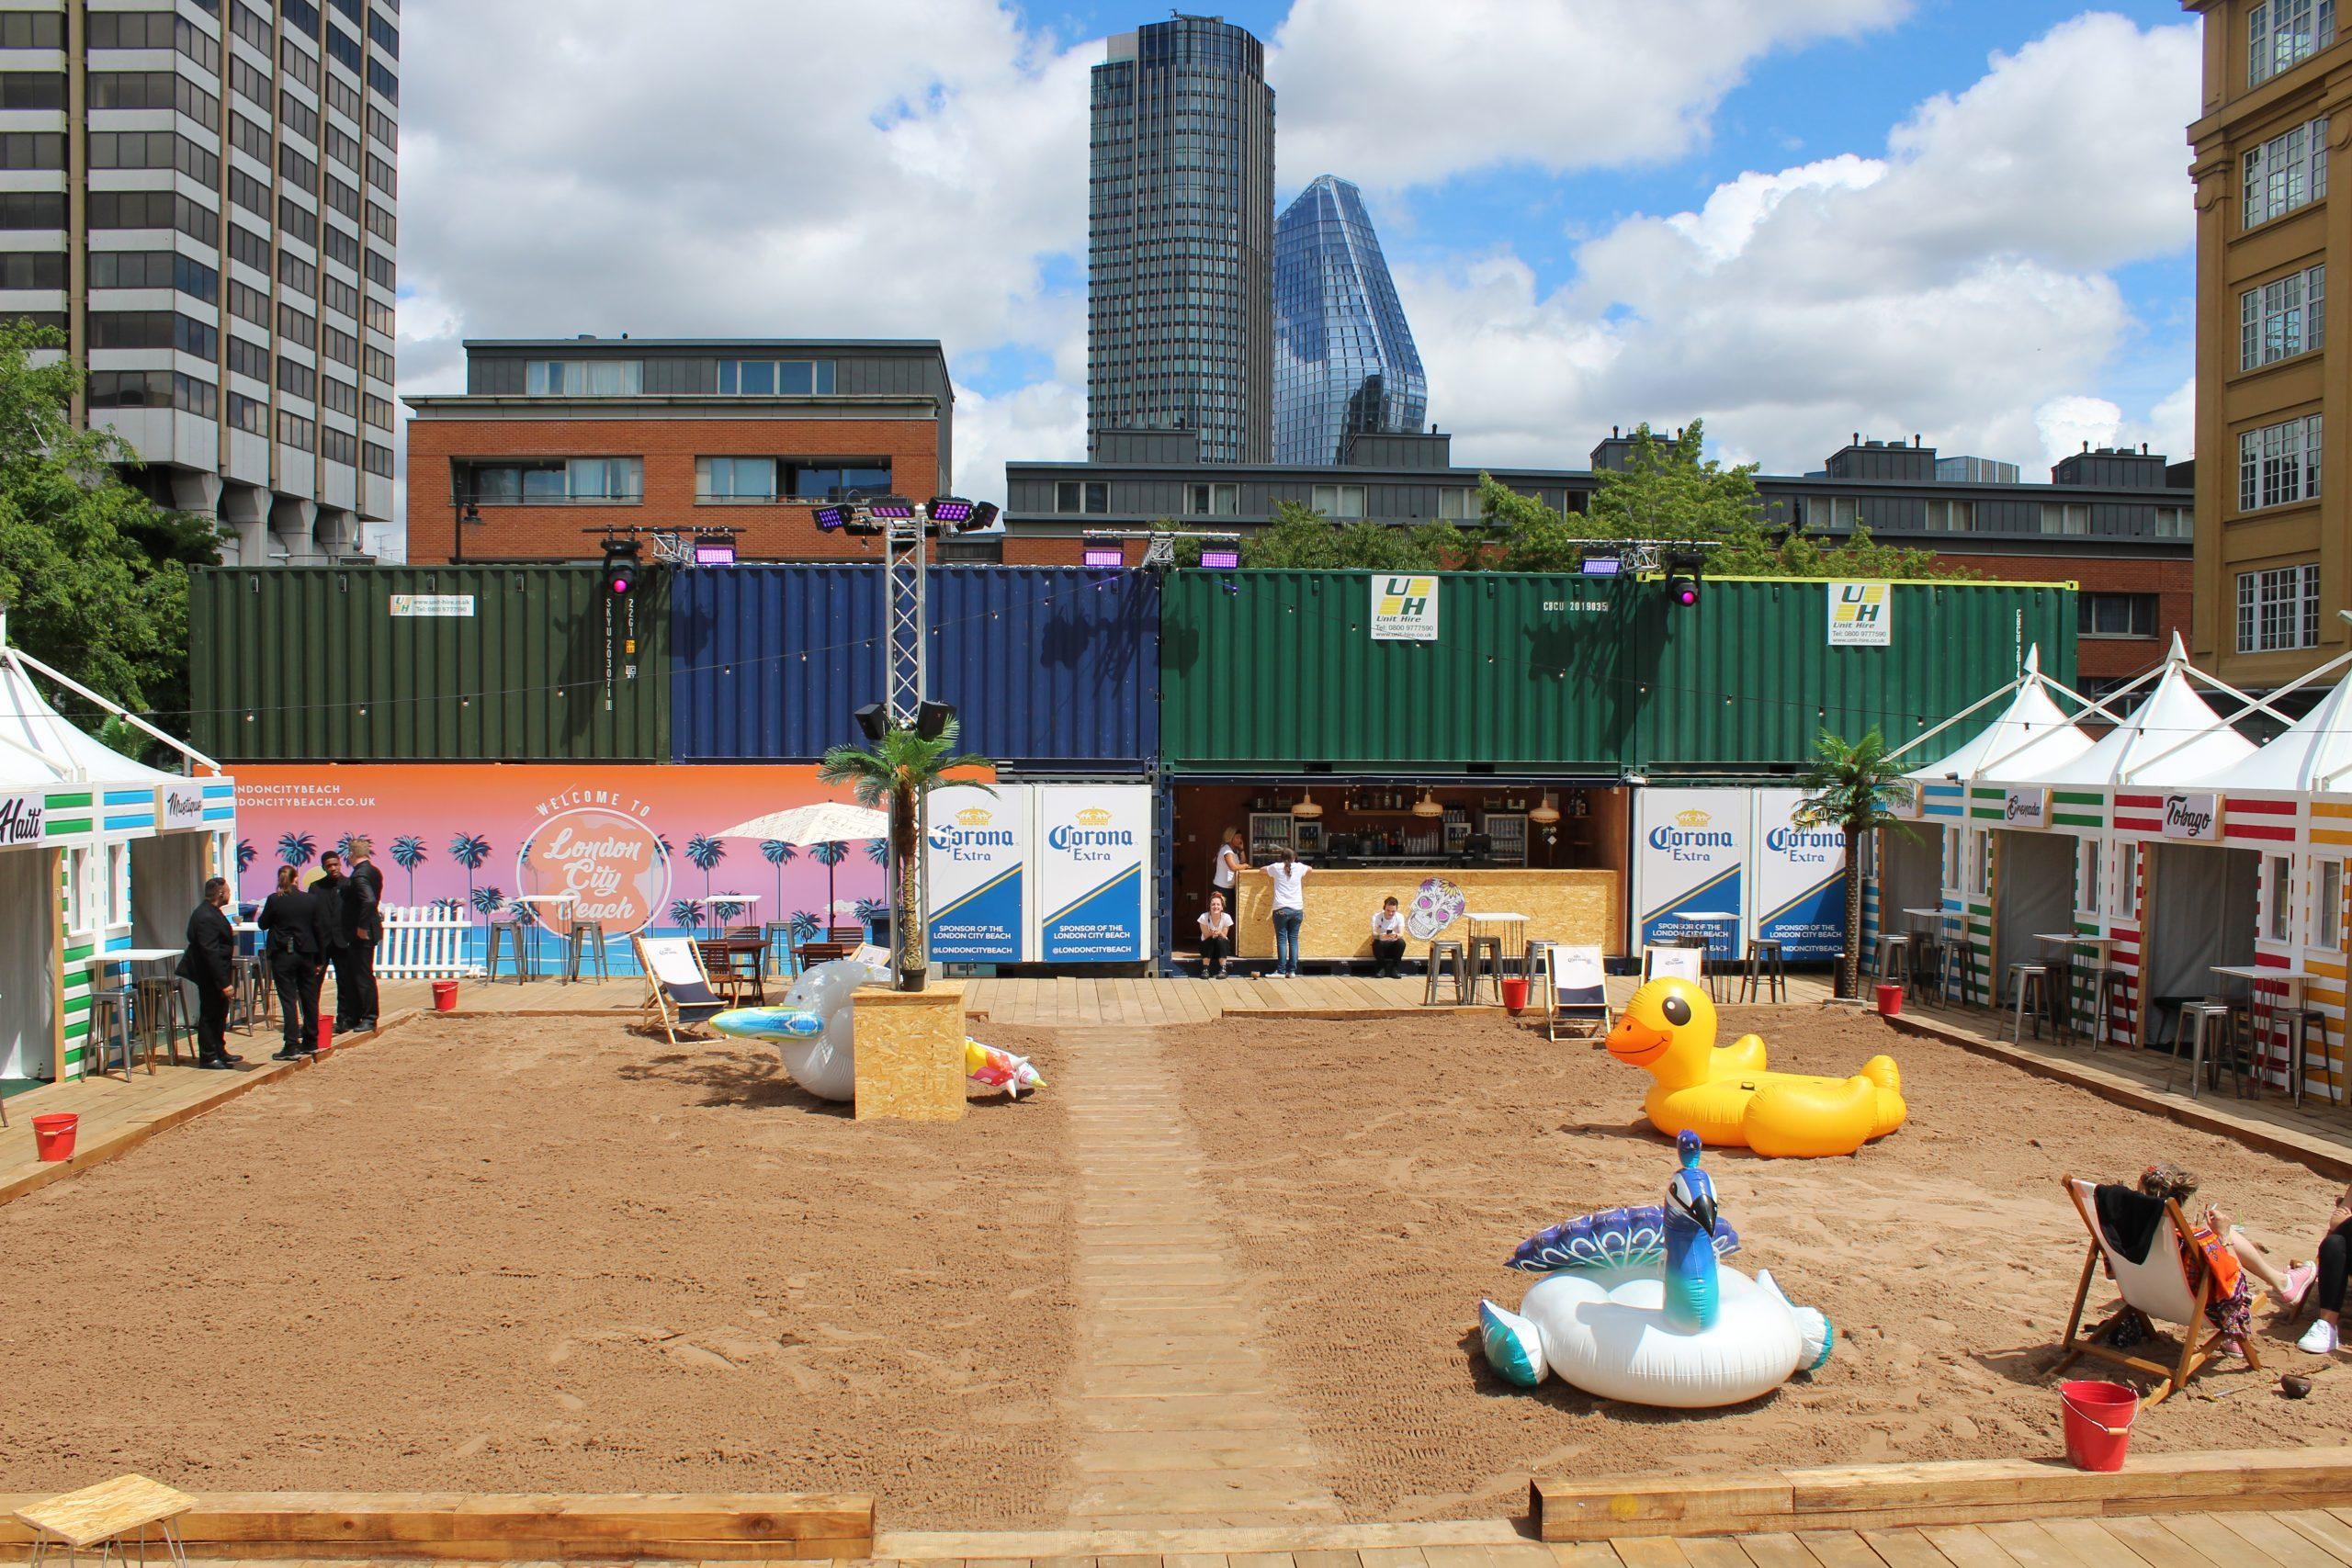 London Corporate summer venue party hire